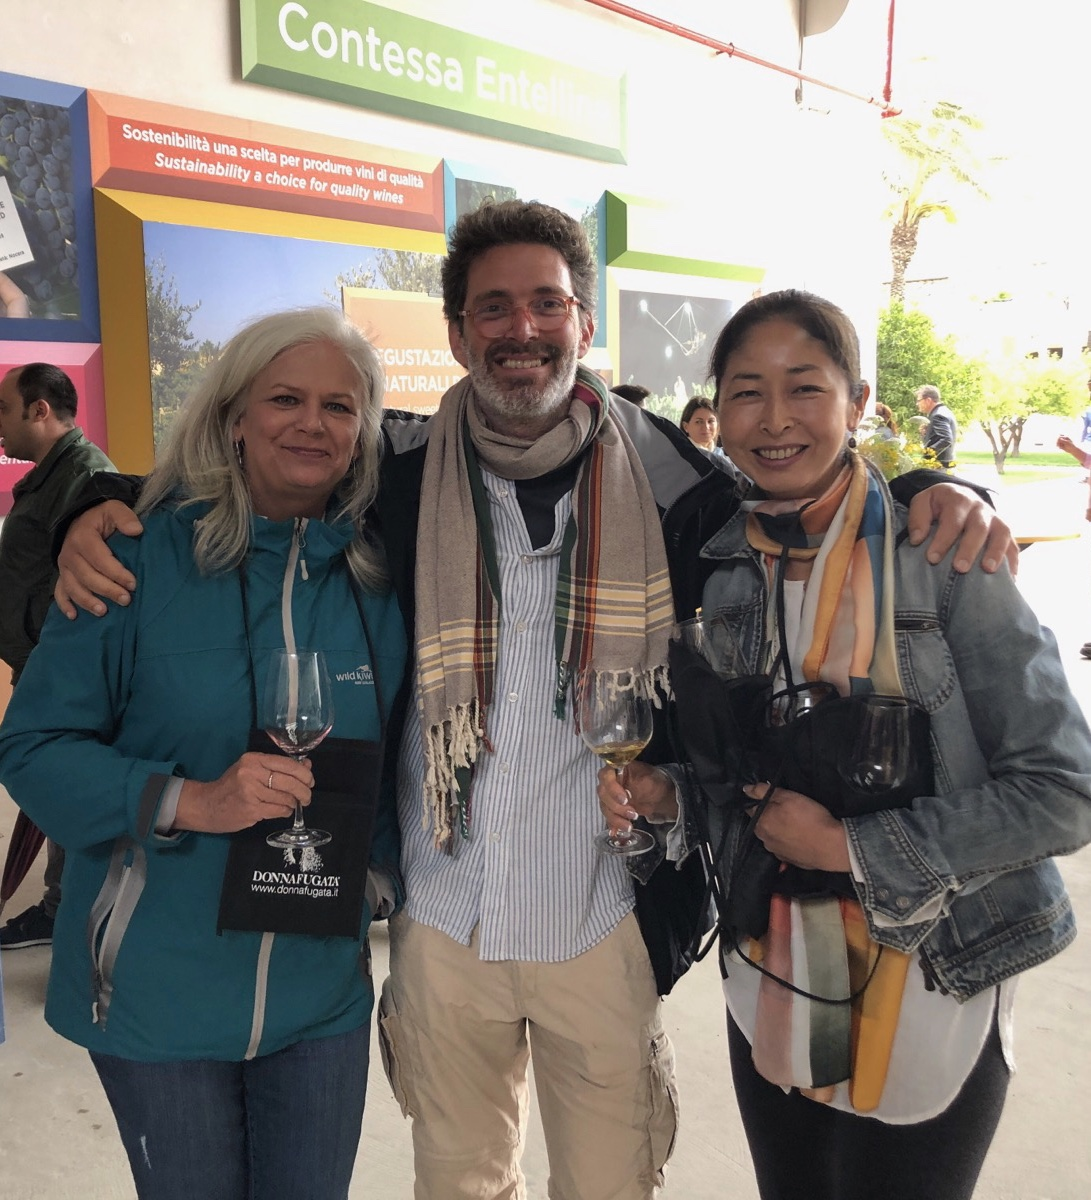 Lori, Adriano, and Yumi at Donnafugata wine tasting.